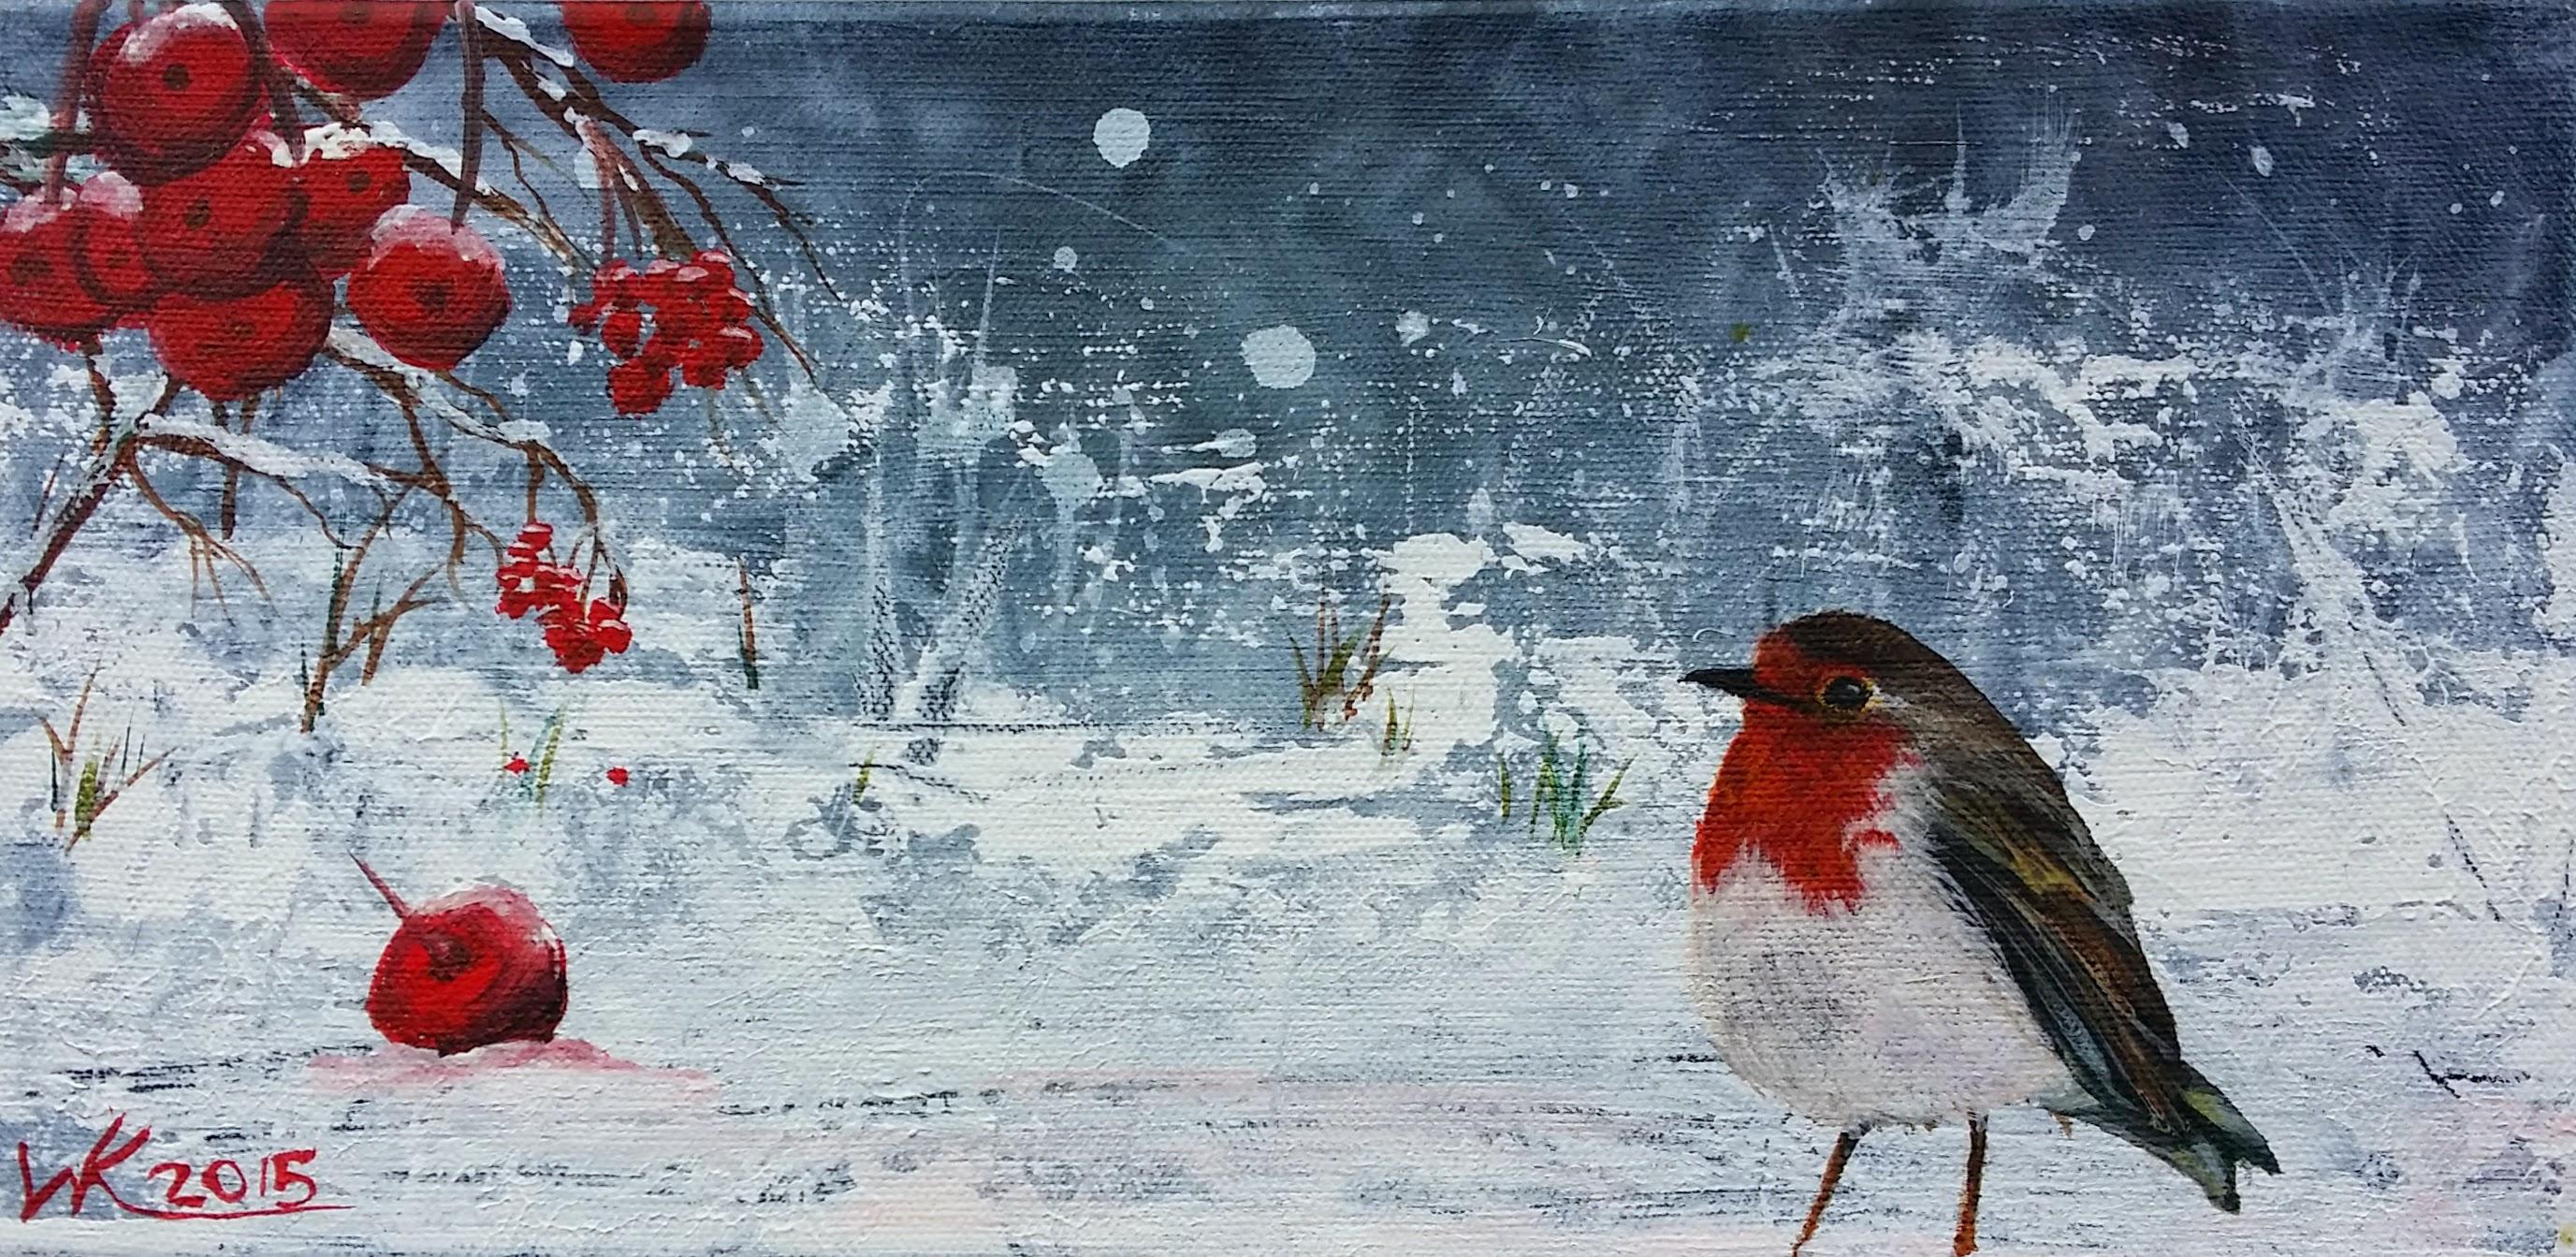 Red Berries (2015)